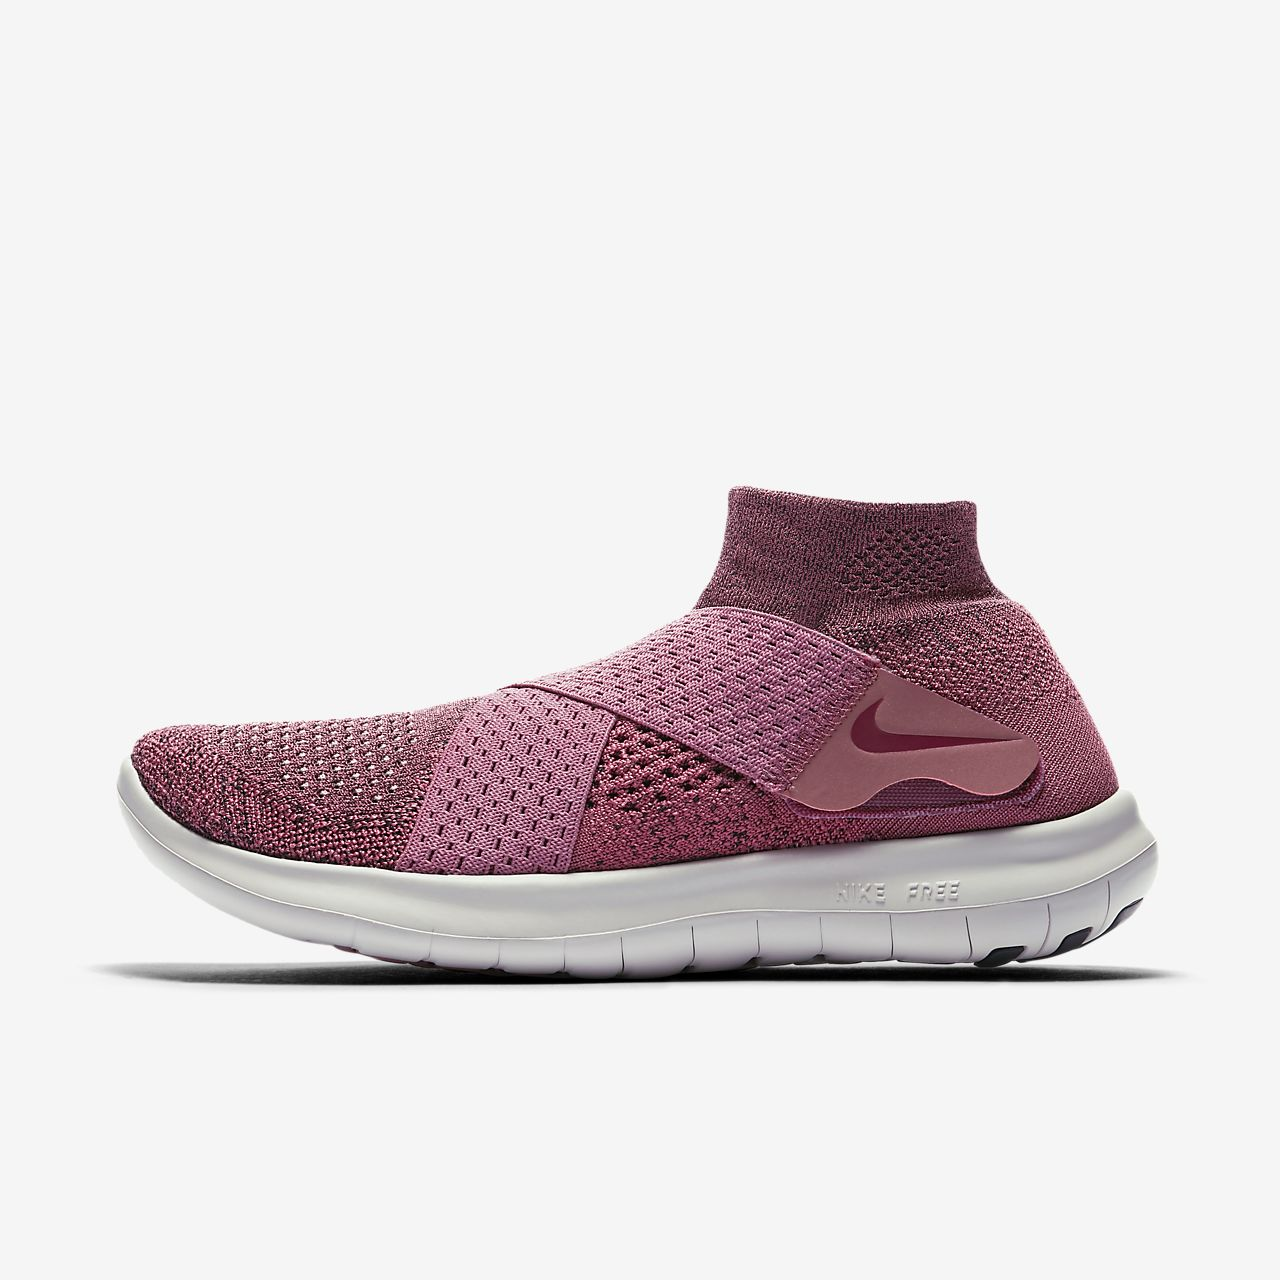 e41a2d41 Женские беговые кроссовки Nike Free RN Motion Flyknit 2017. Nike.com RU